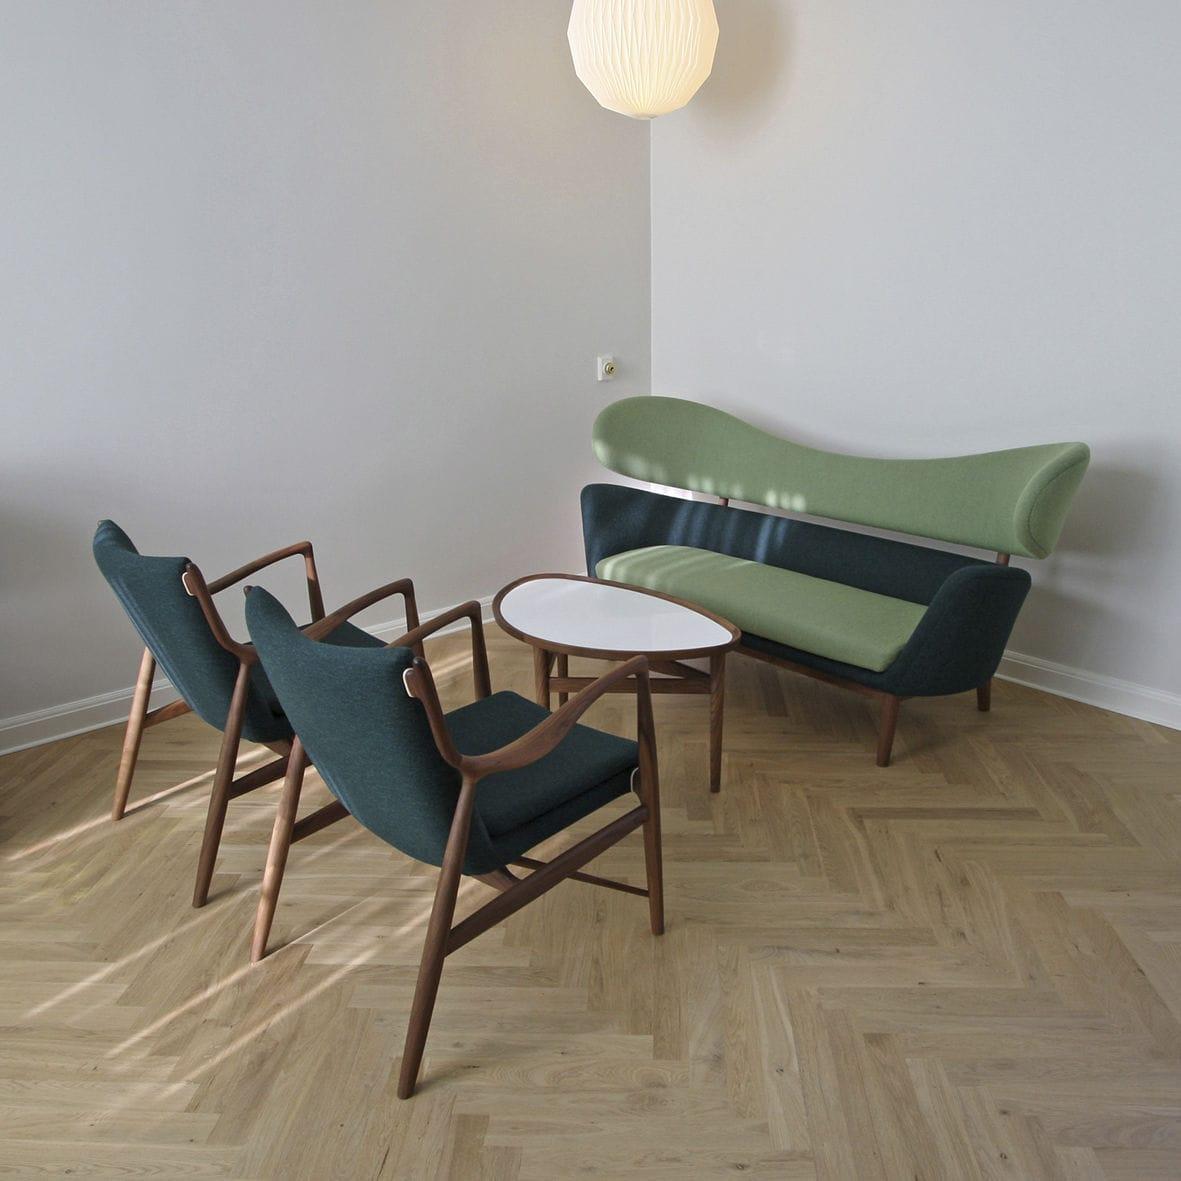 divano design scandinavo / in lana / in teak / in noce - baker